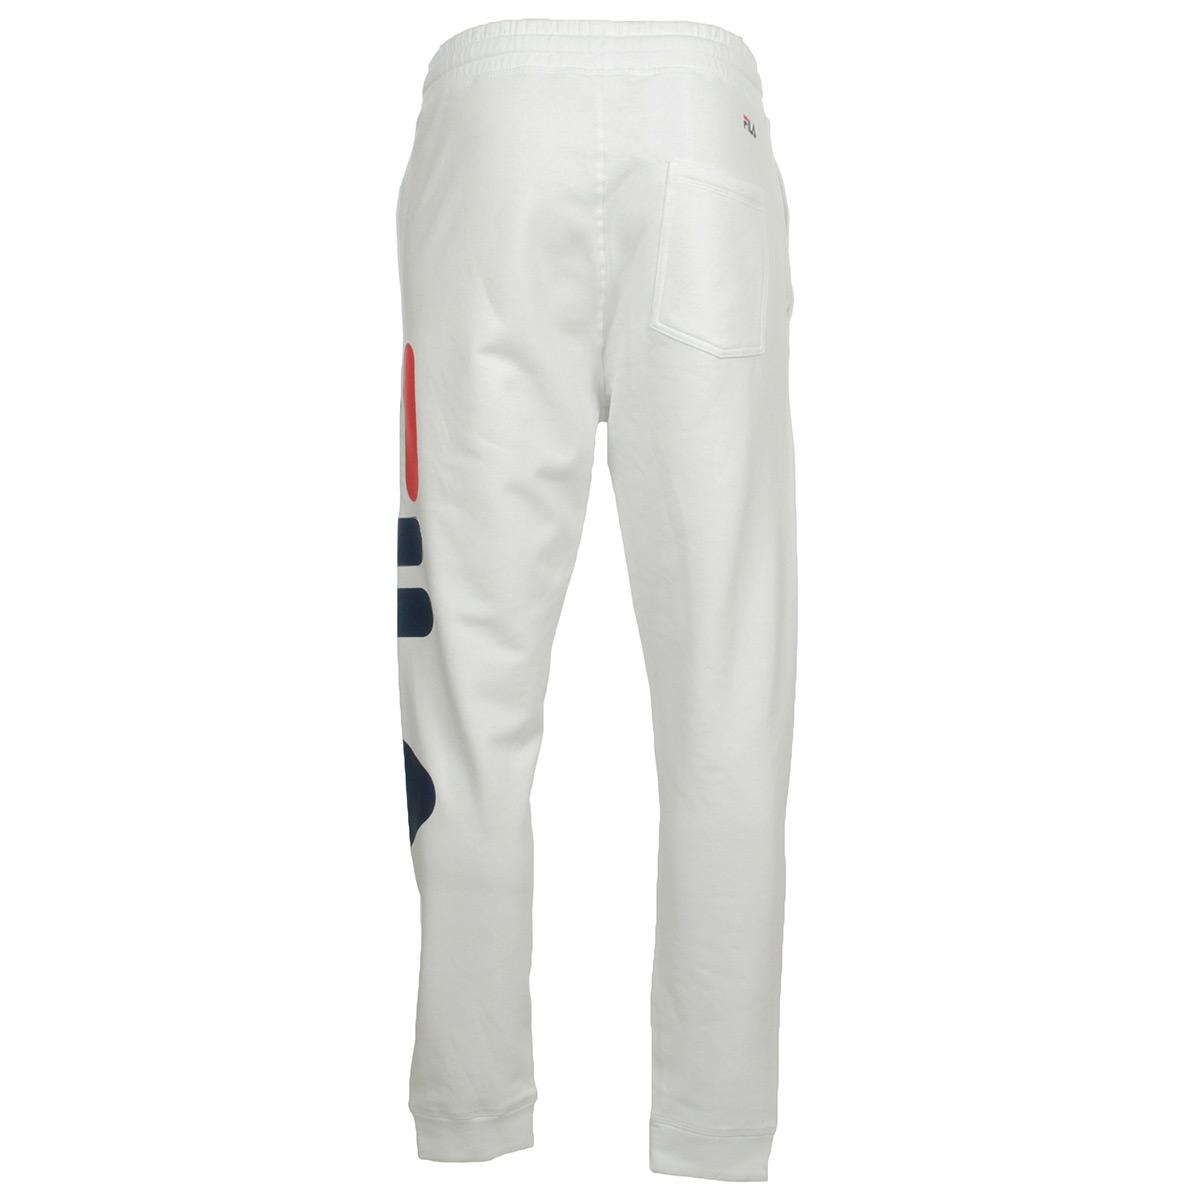 Fila Classic Basic Pants 681275M67, Pantalons